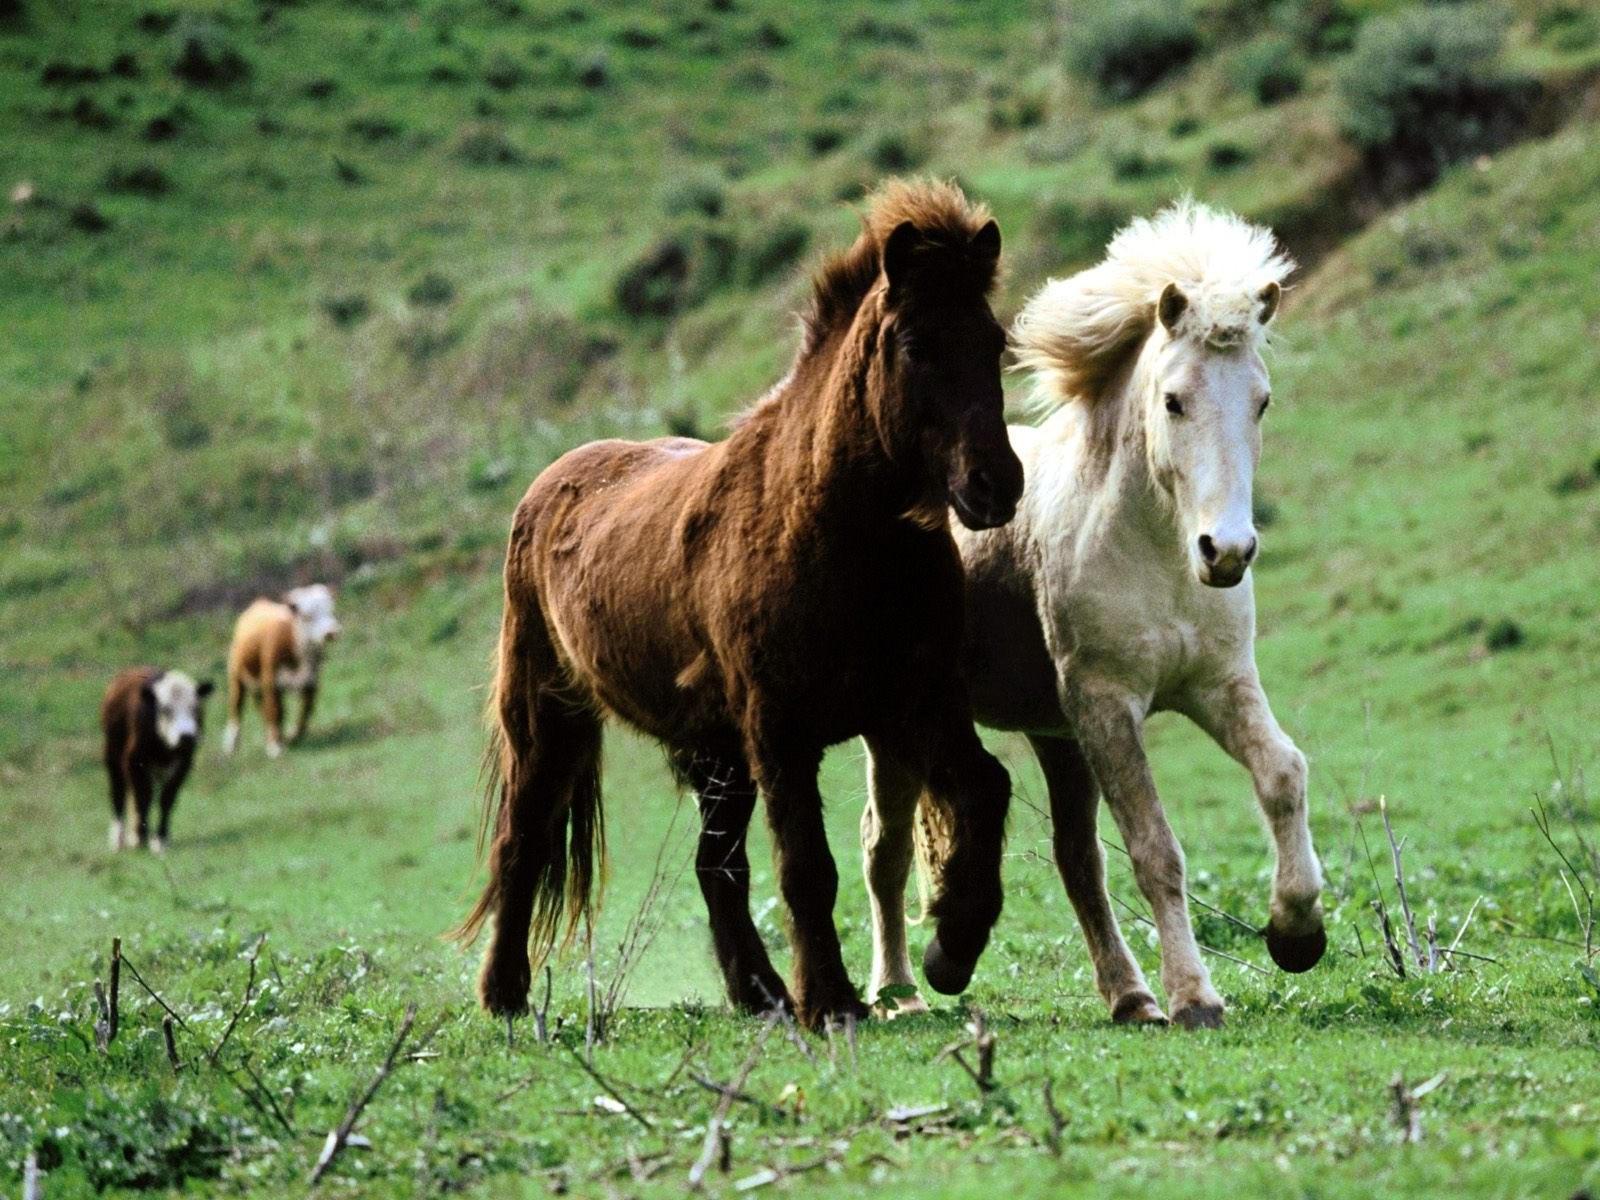 Бегущая пара лошадей